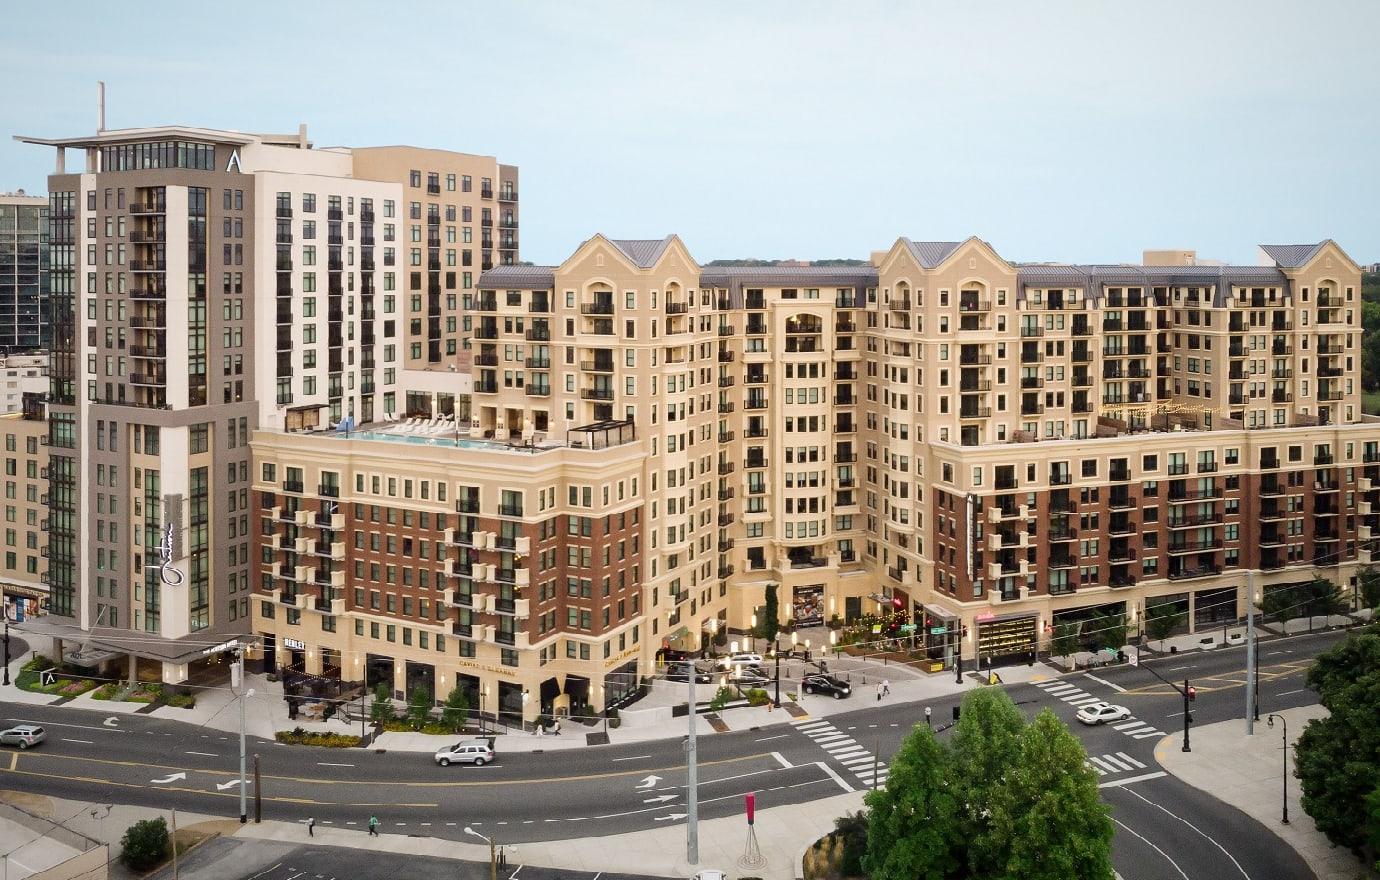 Aertson Midtown Apartments in downtown Nashville